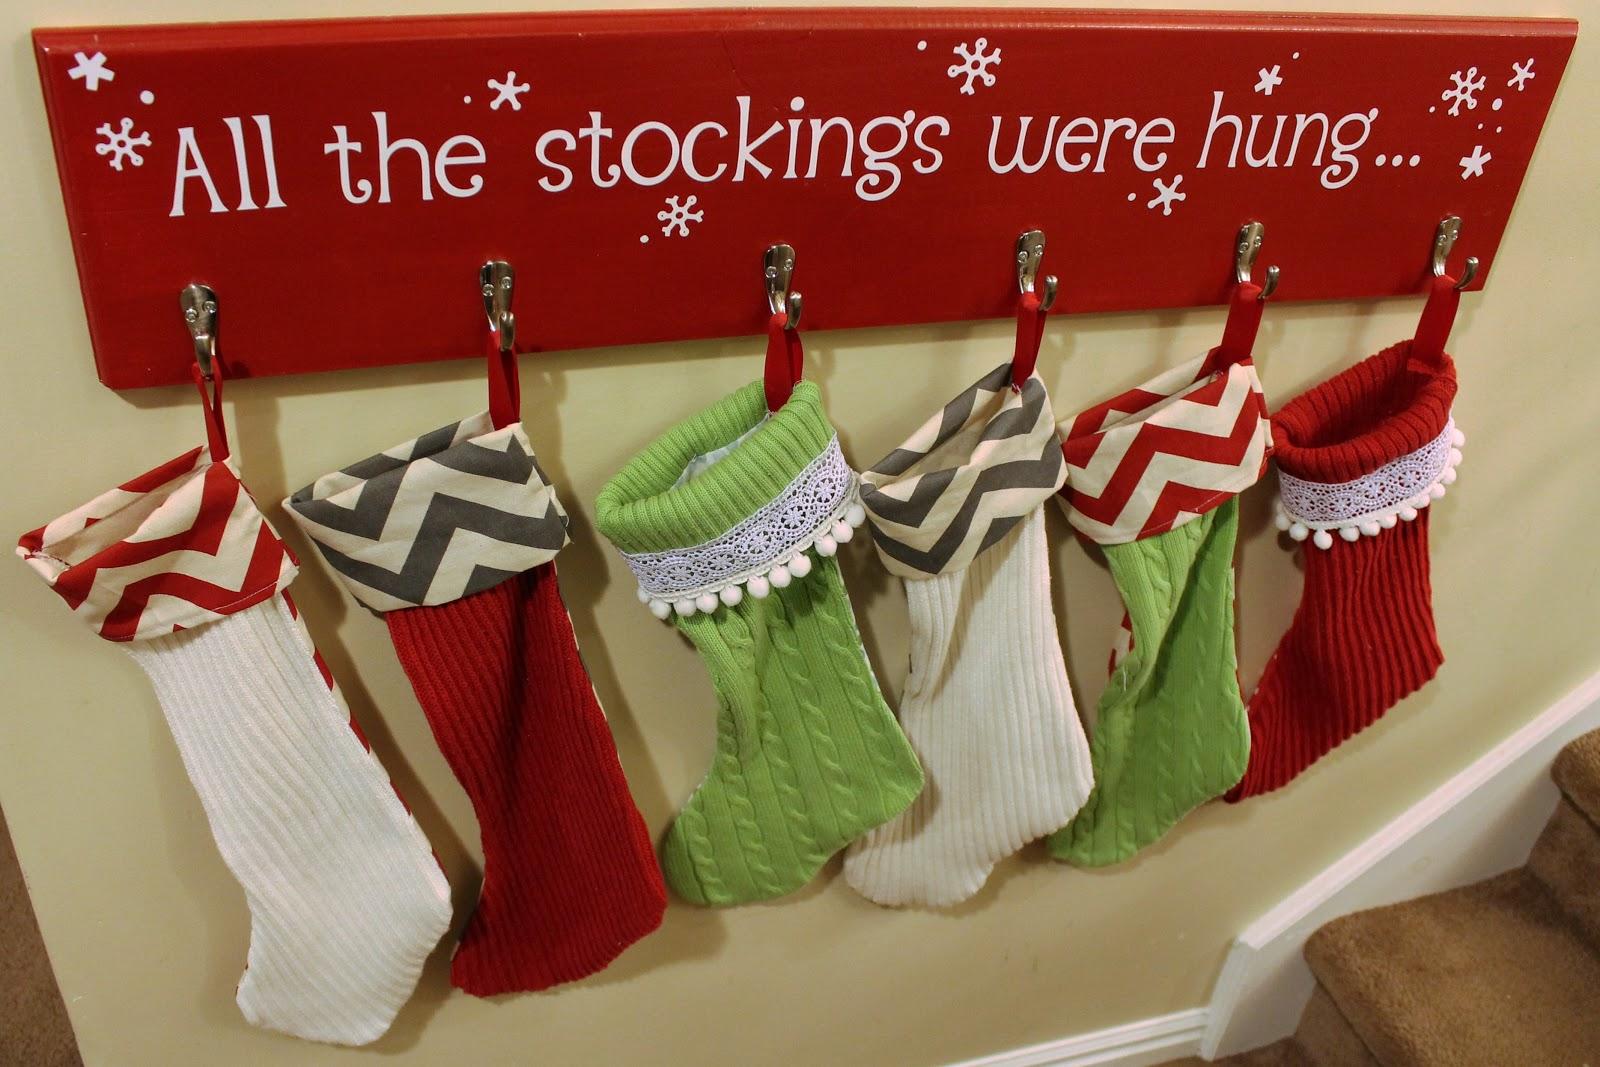 Stocking hanger